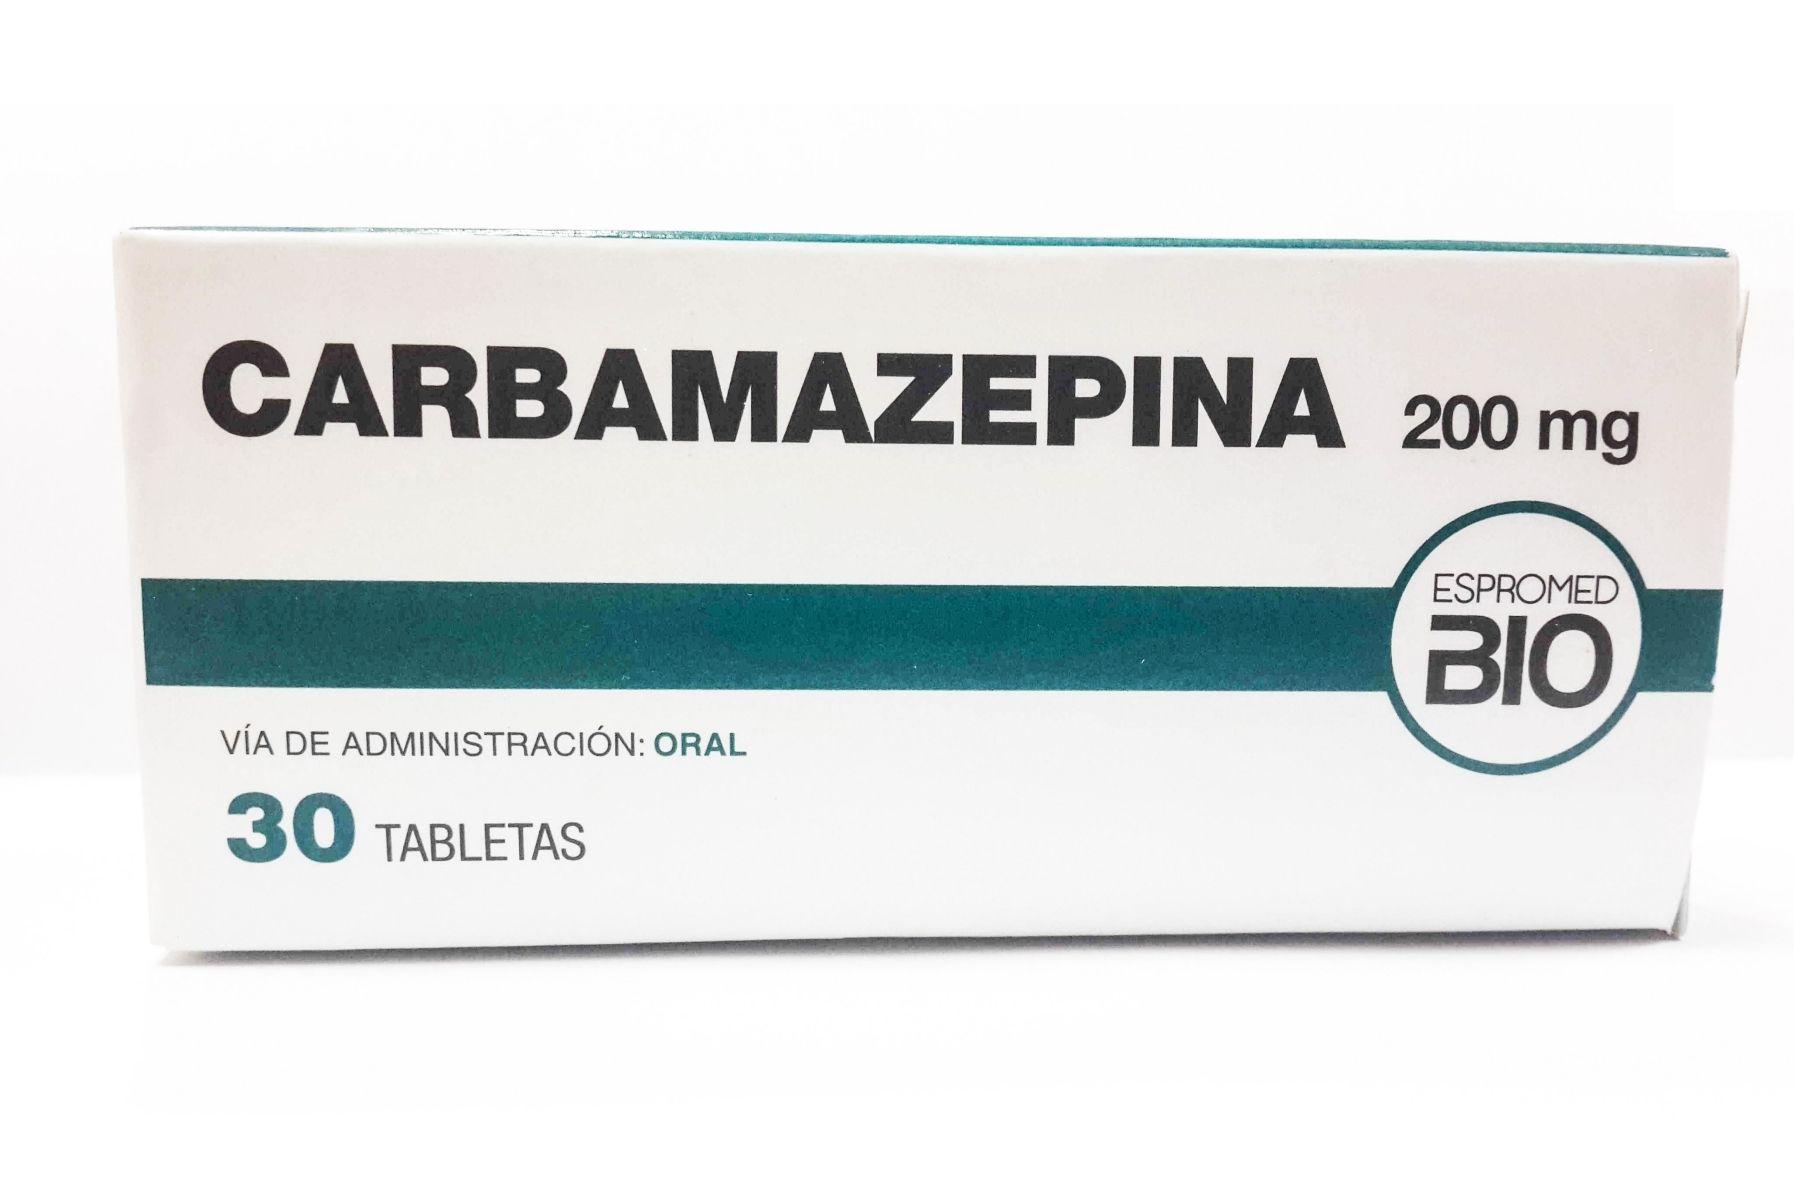 CARBAMAZEPINA espromed nueva